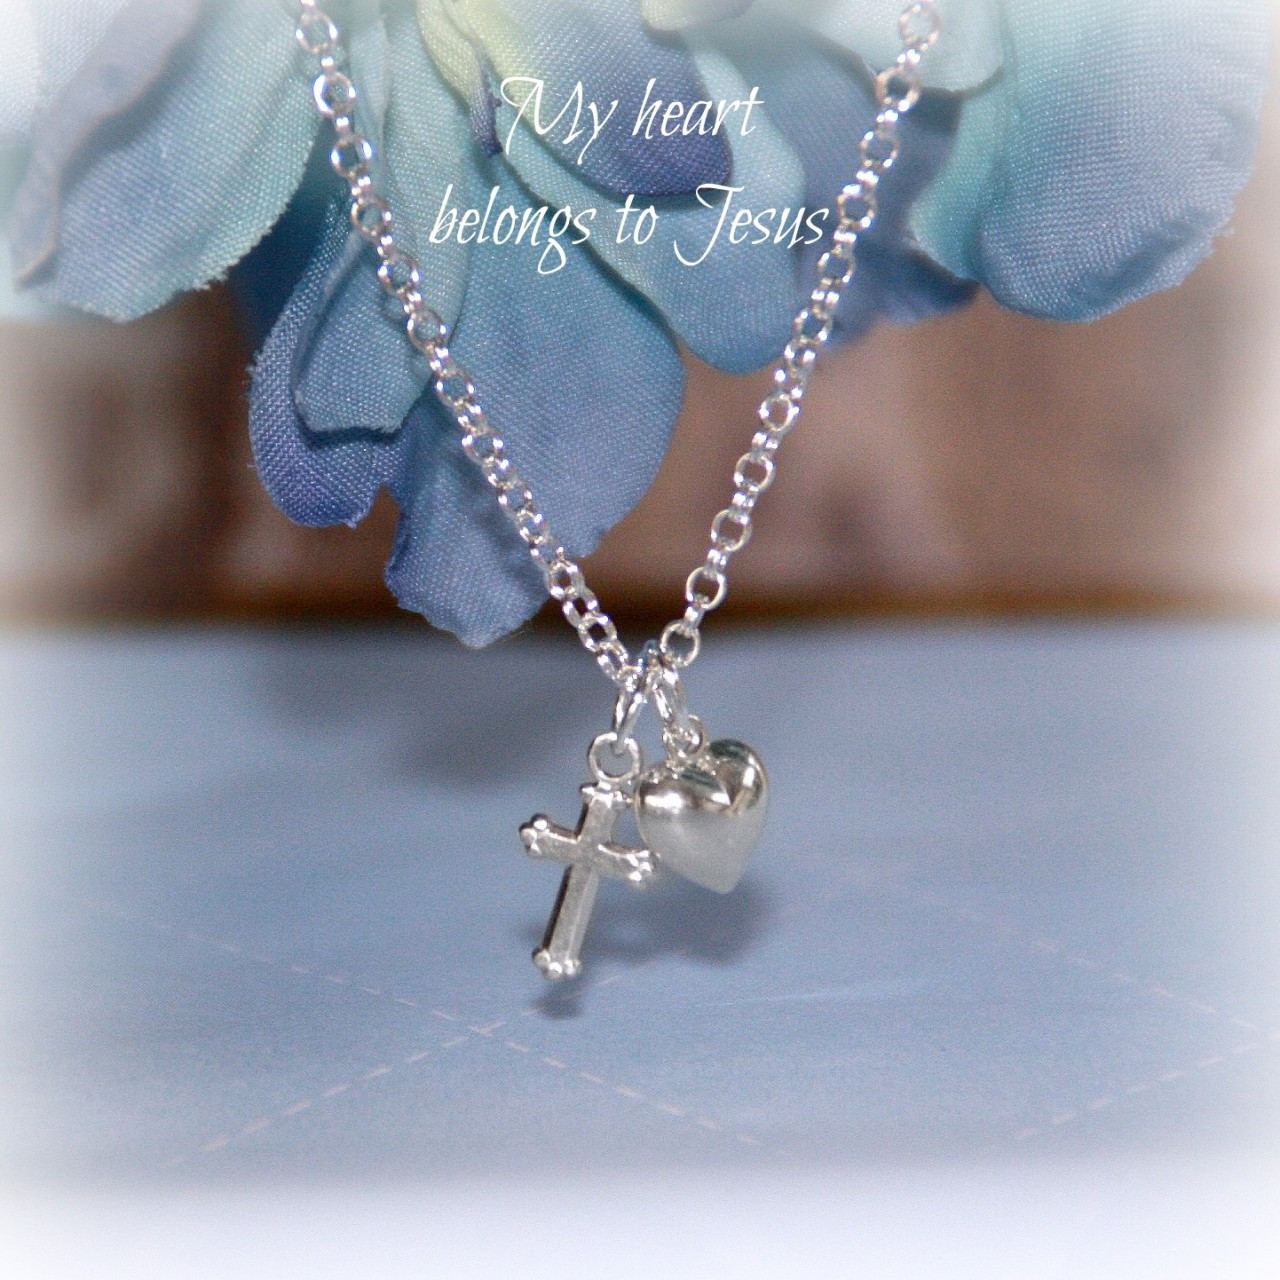 STG-208  My Heart Belongs to Jesus Sterling Silver Necklace